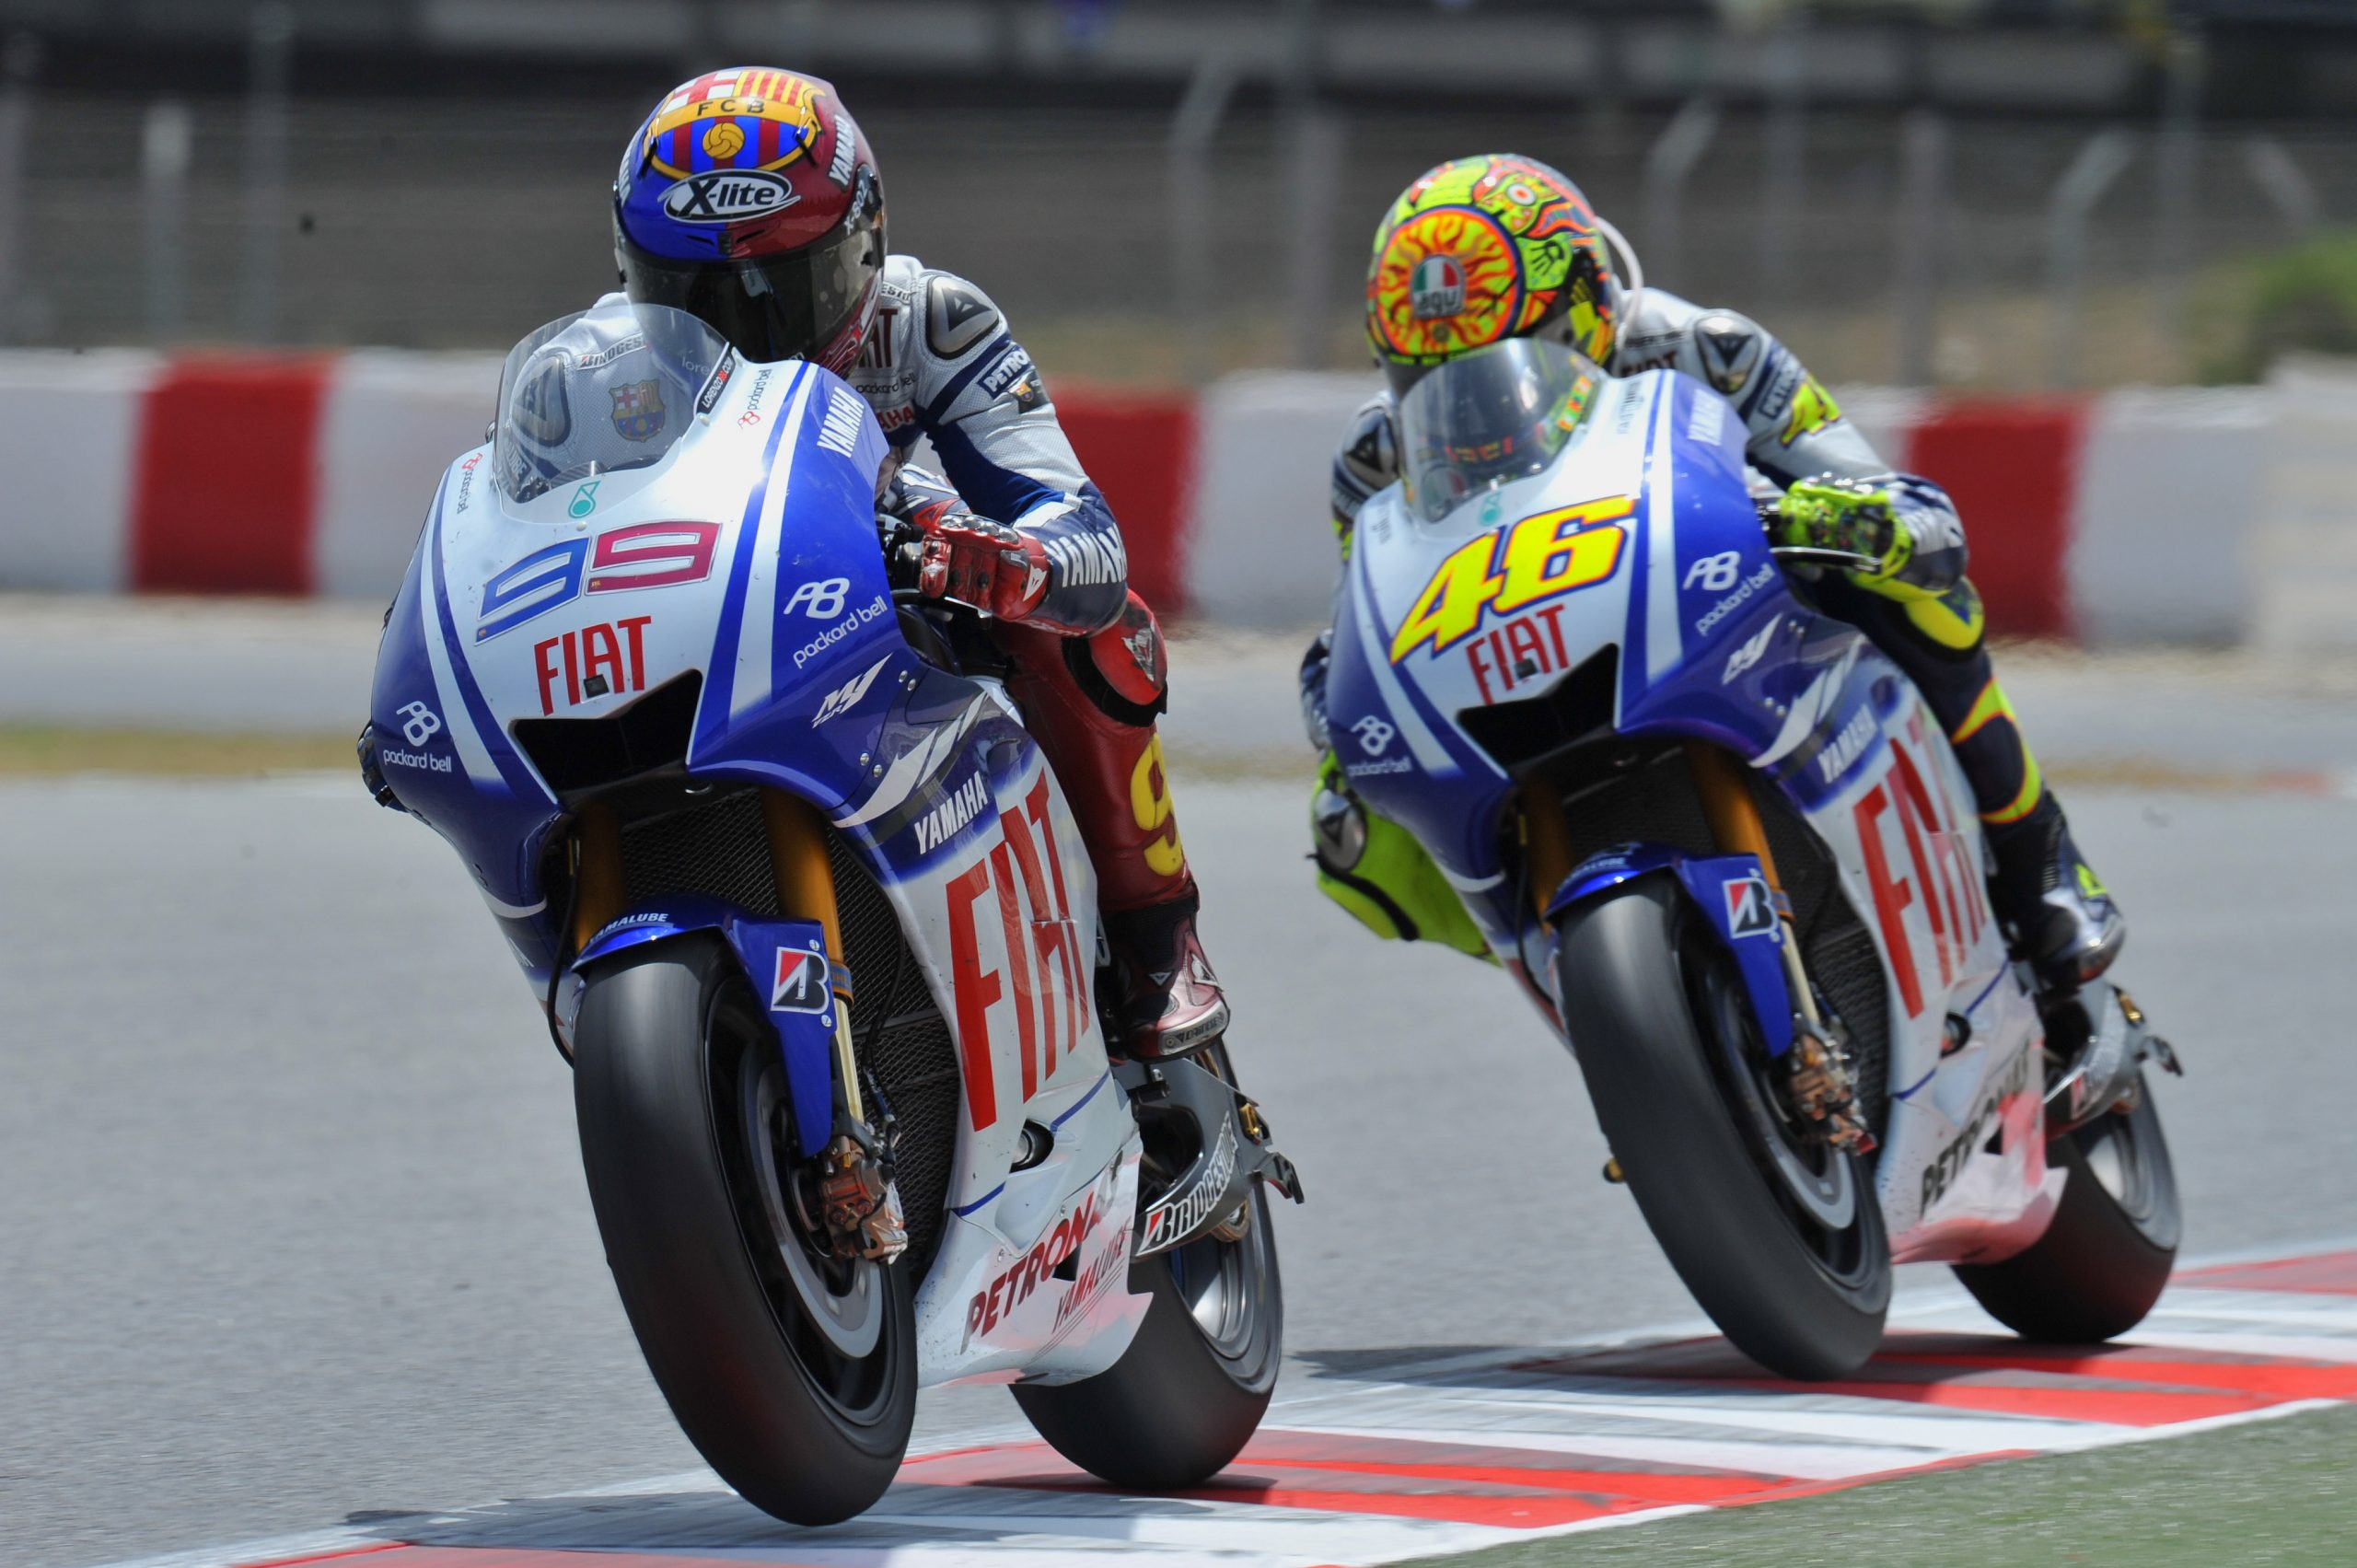 Valentino Rossi vs Jorge Lorenzo w Katalonii w 2009 roku